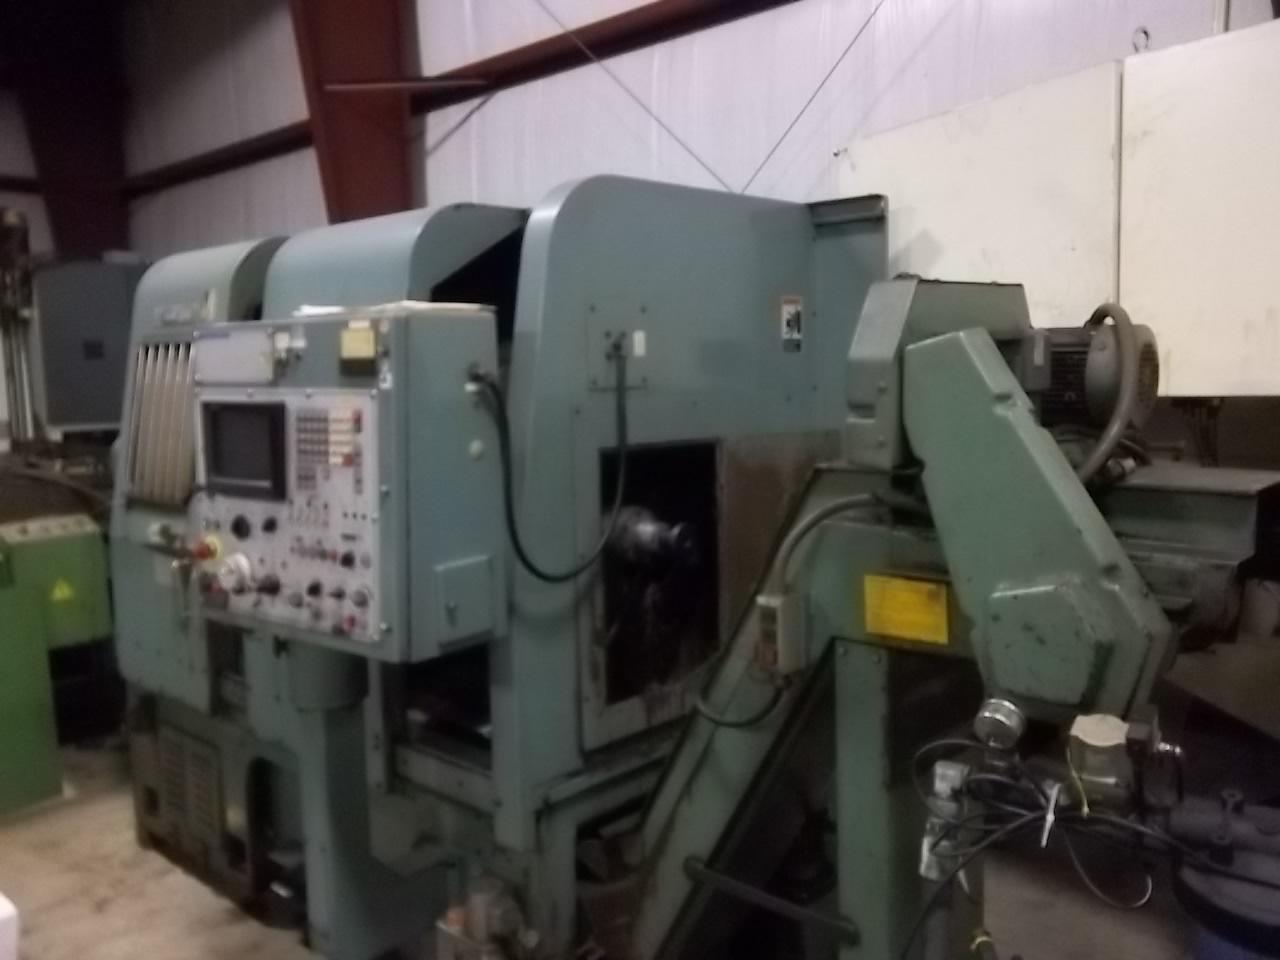 Mori Seiki Nl3000 specs Maintenance manual Pdf